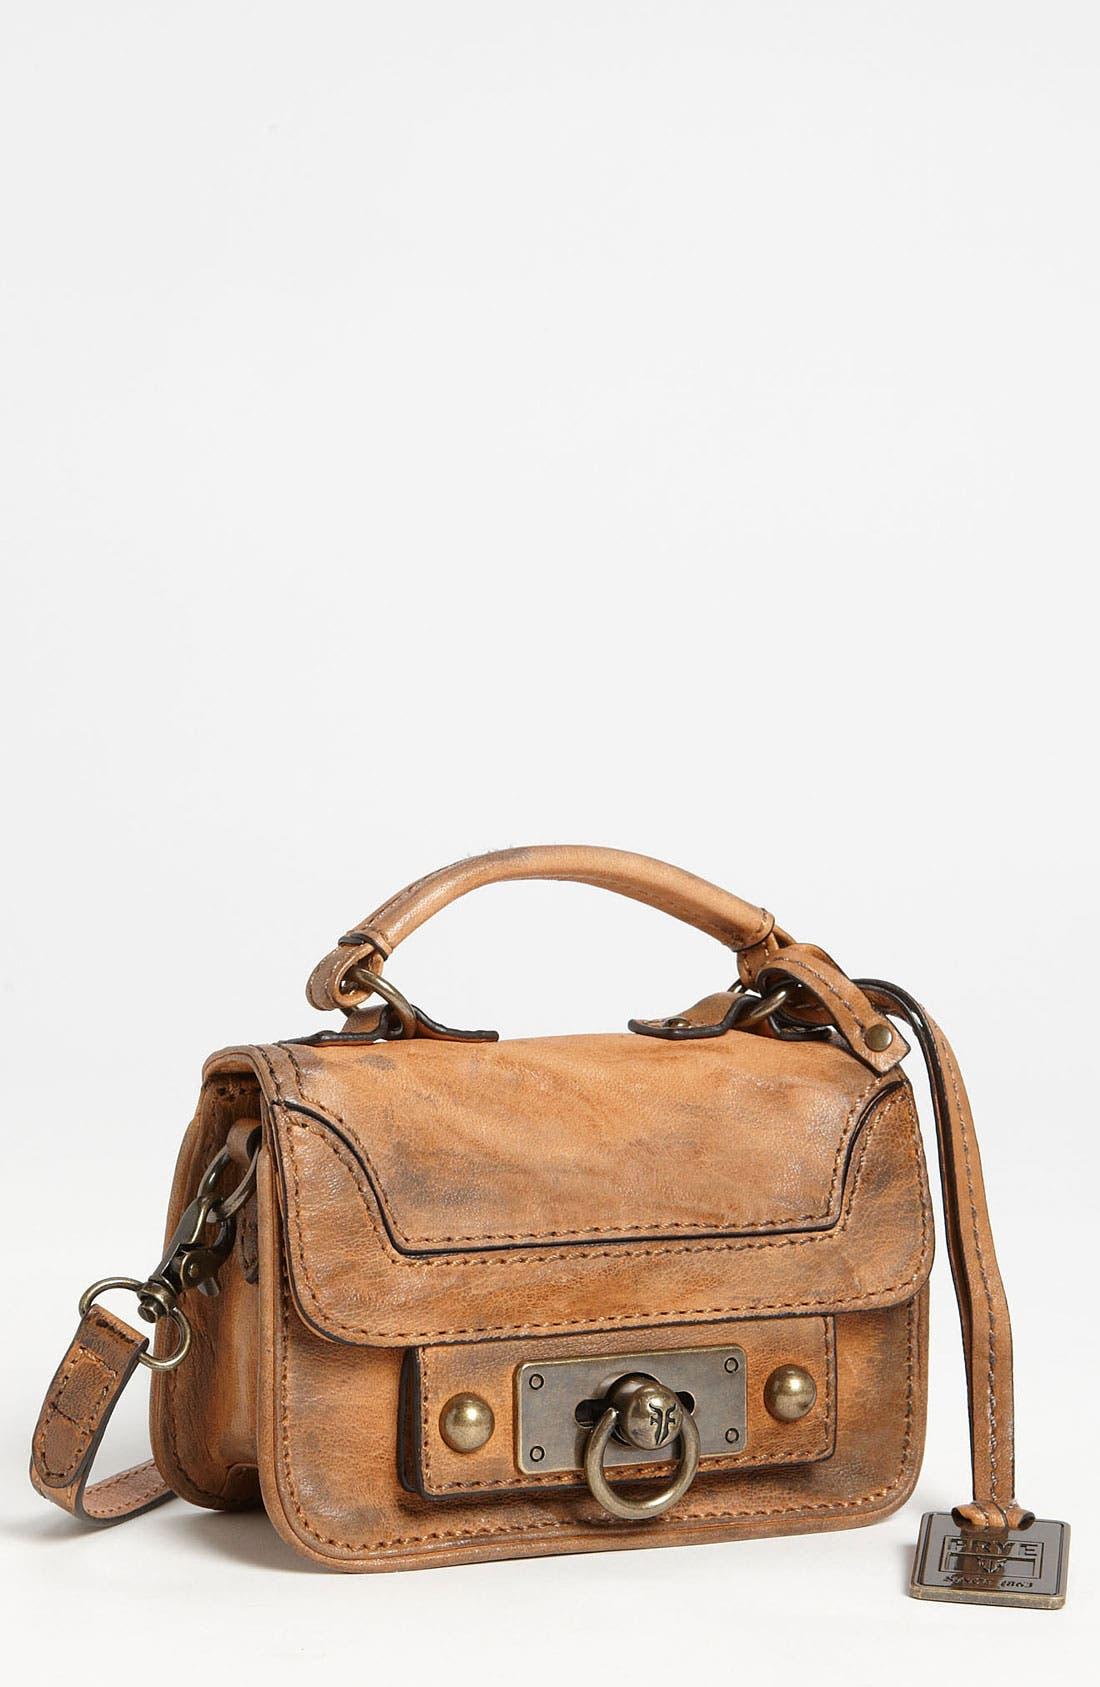 Alternate Image 1 Selected - Frye 'Cameron - Micro' Crossbody Bag